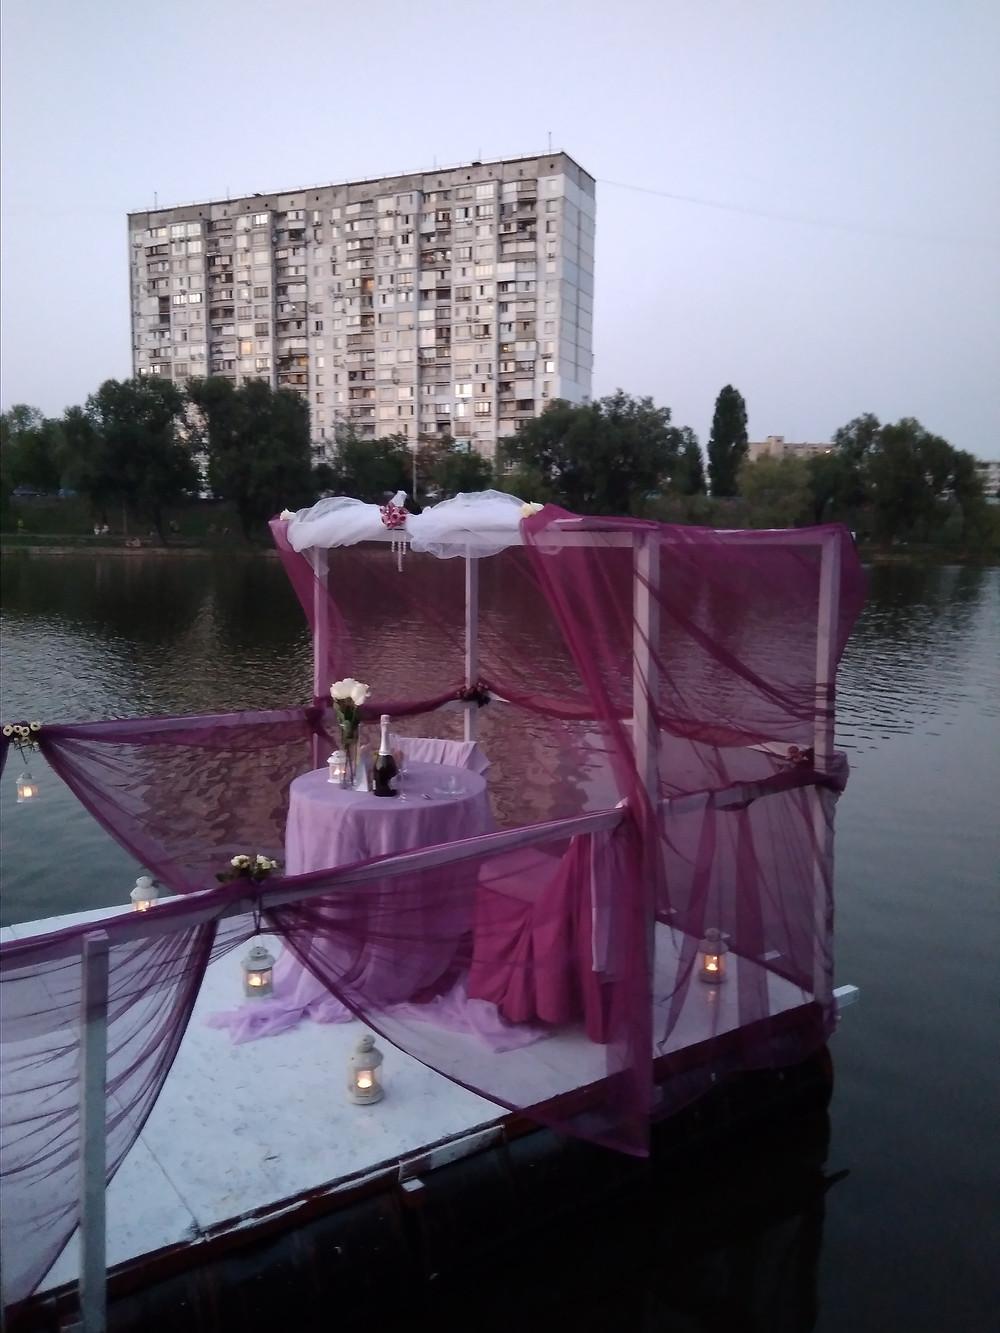 Альтечо, Романтический ужин на плоту посреди озера 9